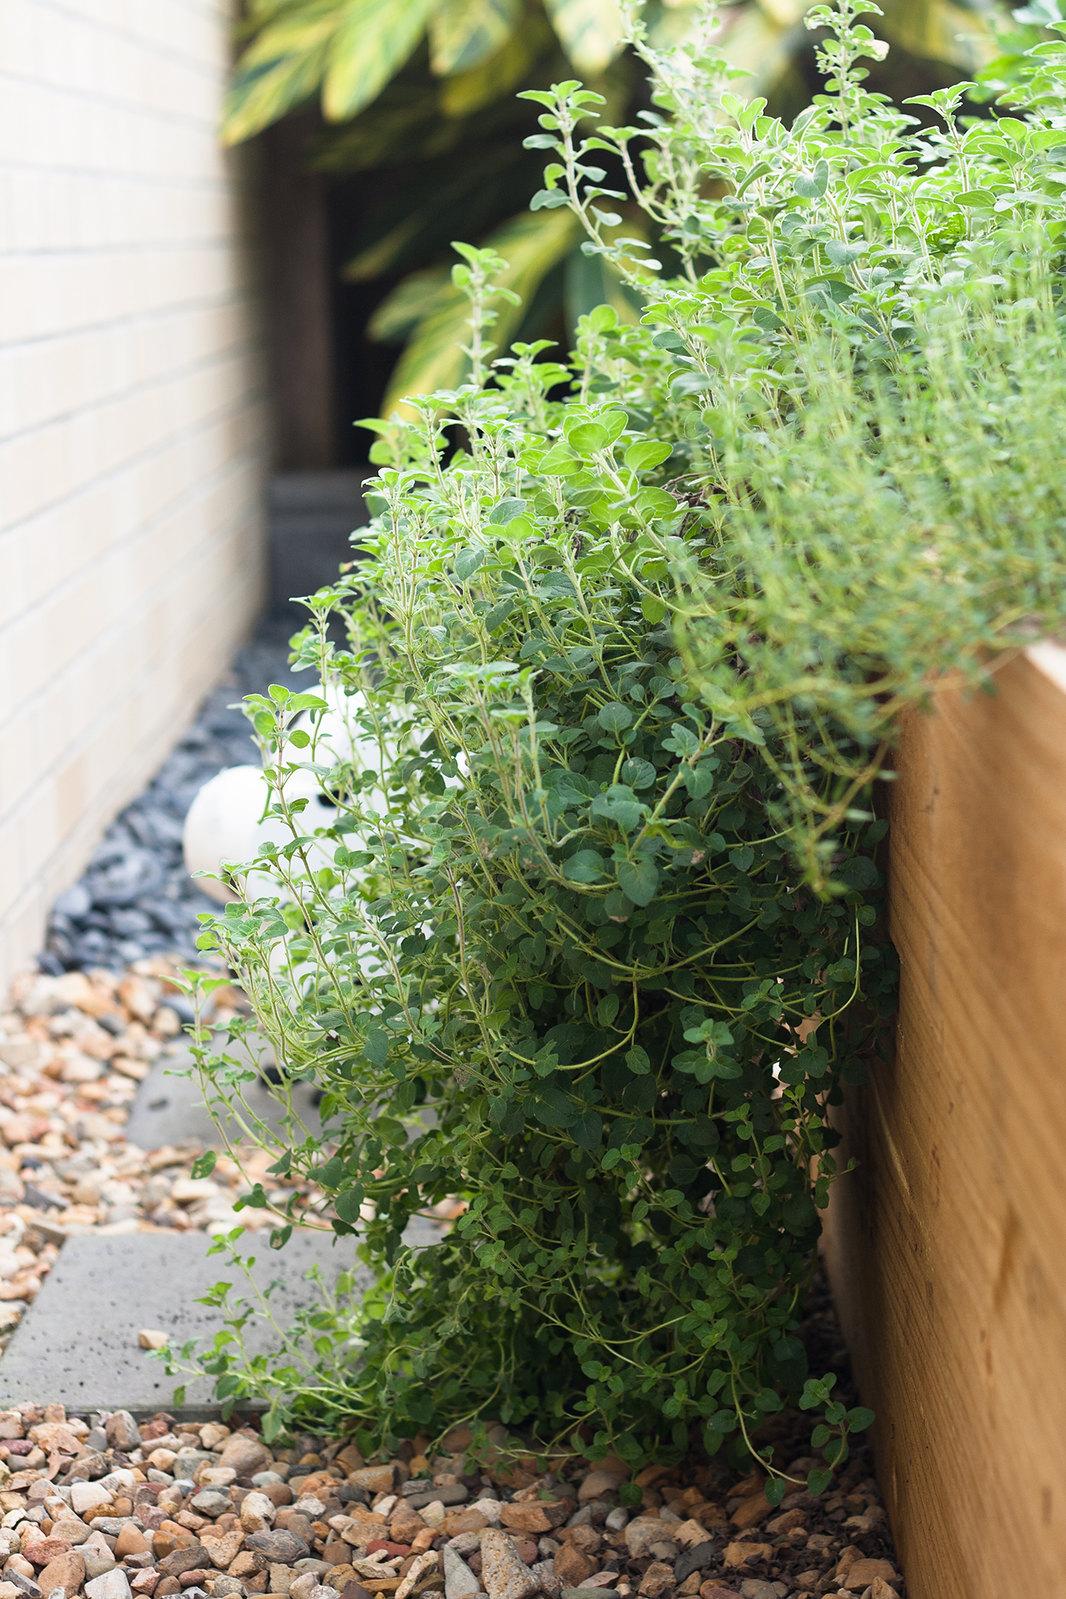 6 month catch-up - Overgrown thyme in herb garden